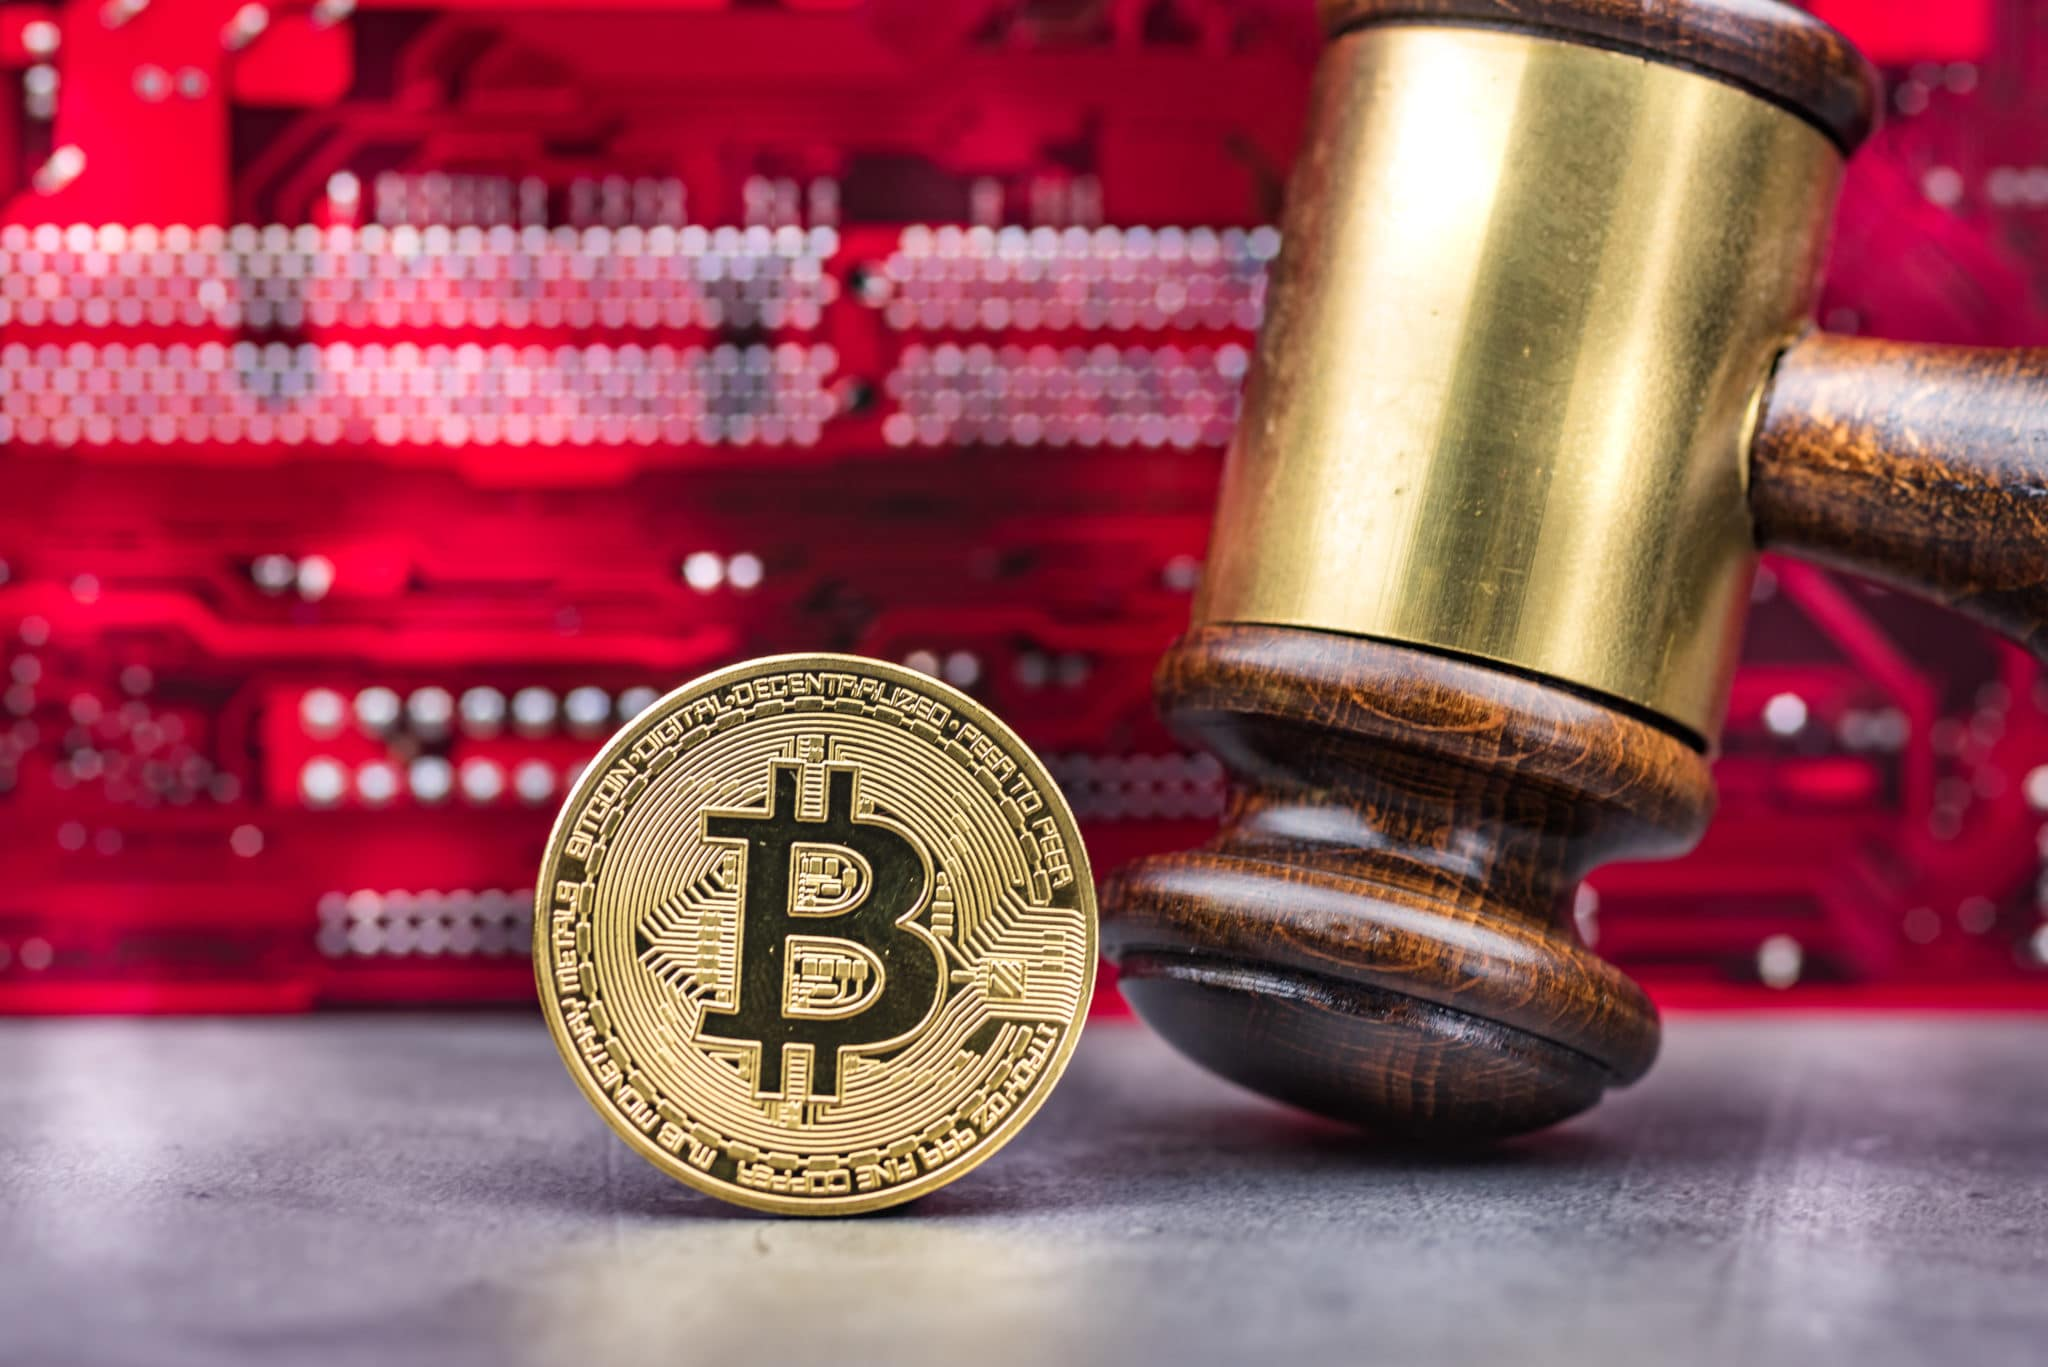 Russland will Kryptowährungen konfiszieren